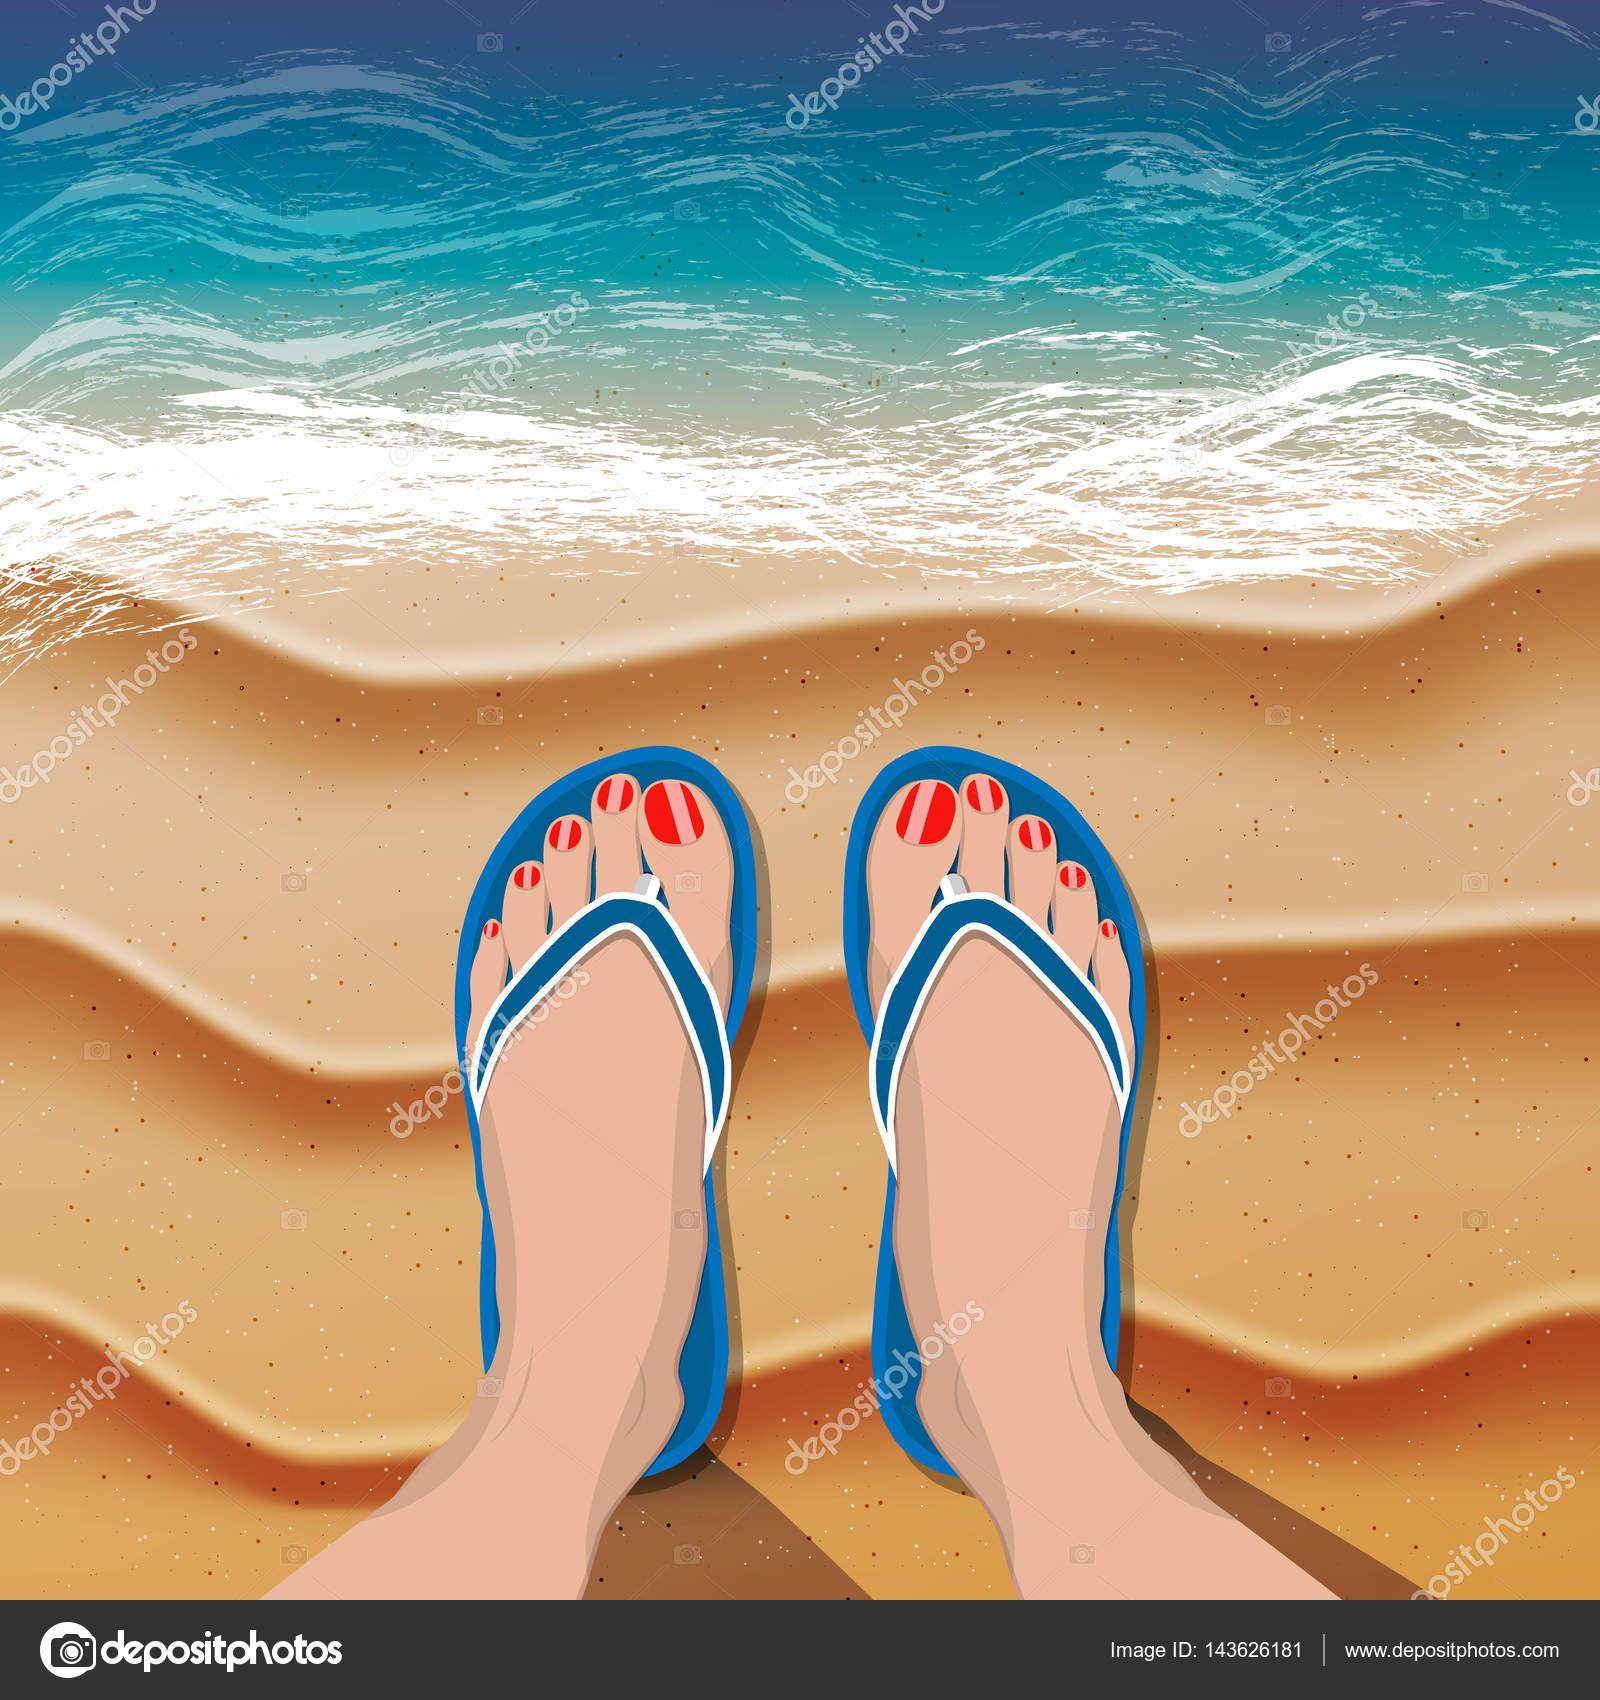 b425bc2a6d Γυναικεία πόδια με κόκκινο πεντικιούρ σε σαγιονάρες στην παραλία με άμμο  και τη θάλασσα. Εικονογράφηση διάνυσμα — Διάνυσμα με ...